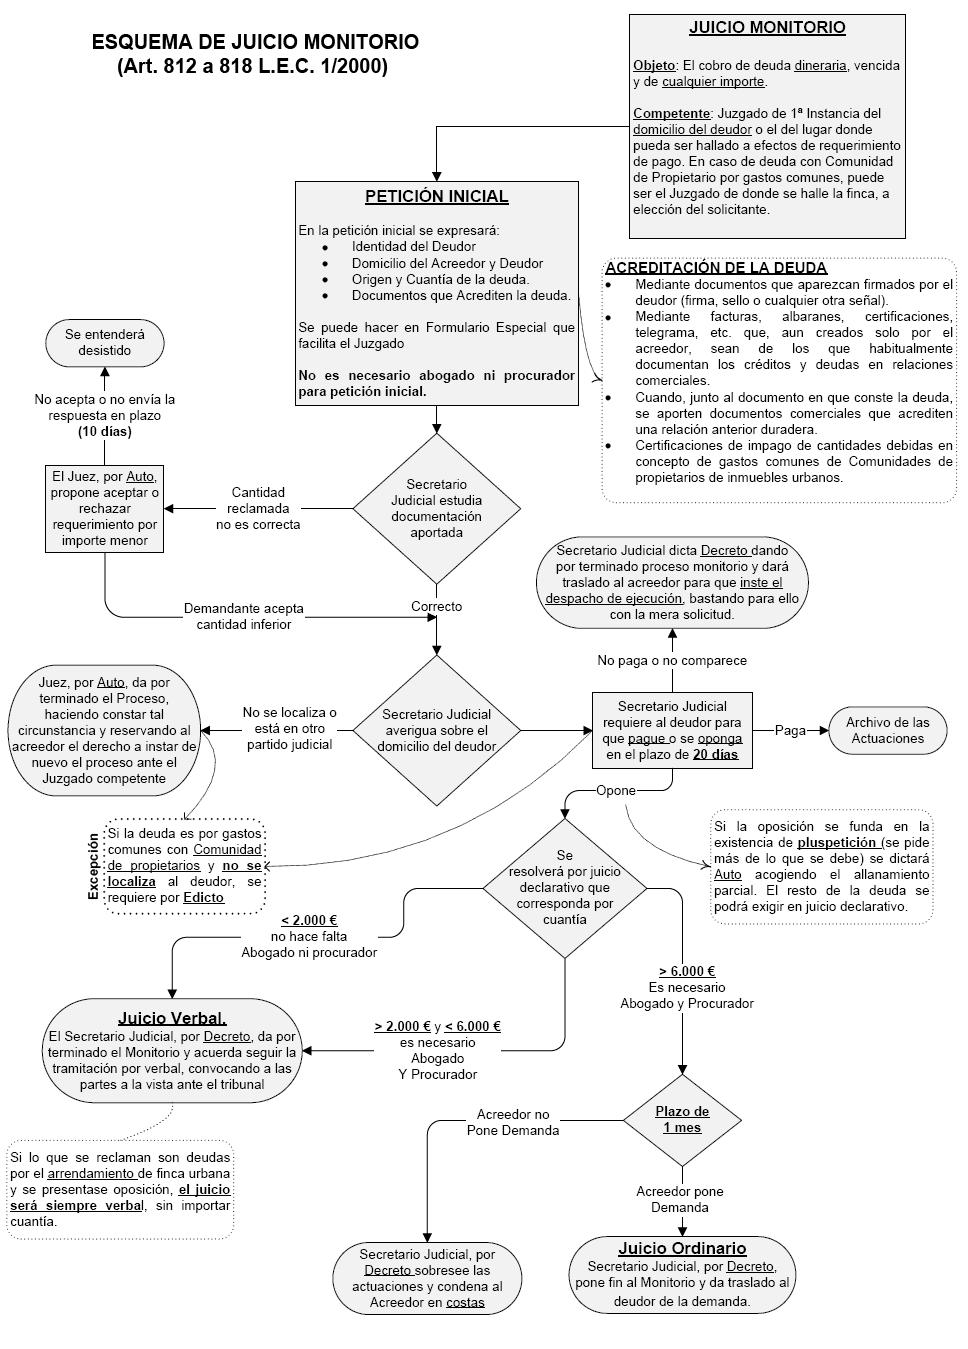 Abogados Derecho Inmobiliario Madrid. Benayas & Asociados. Proceso monitorio